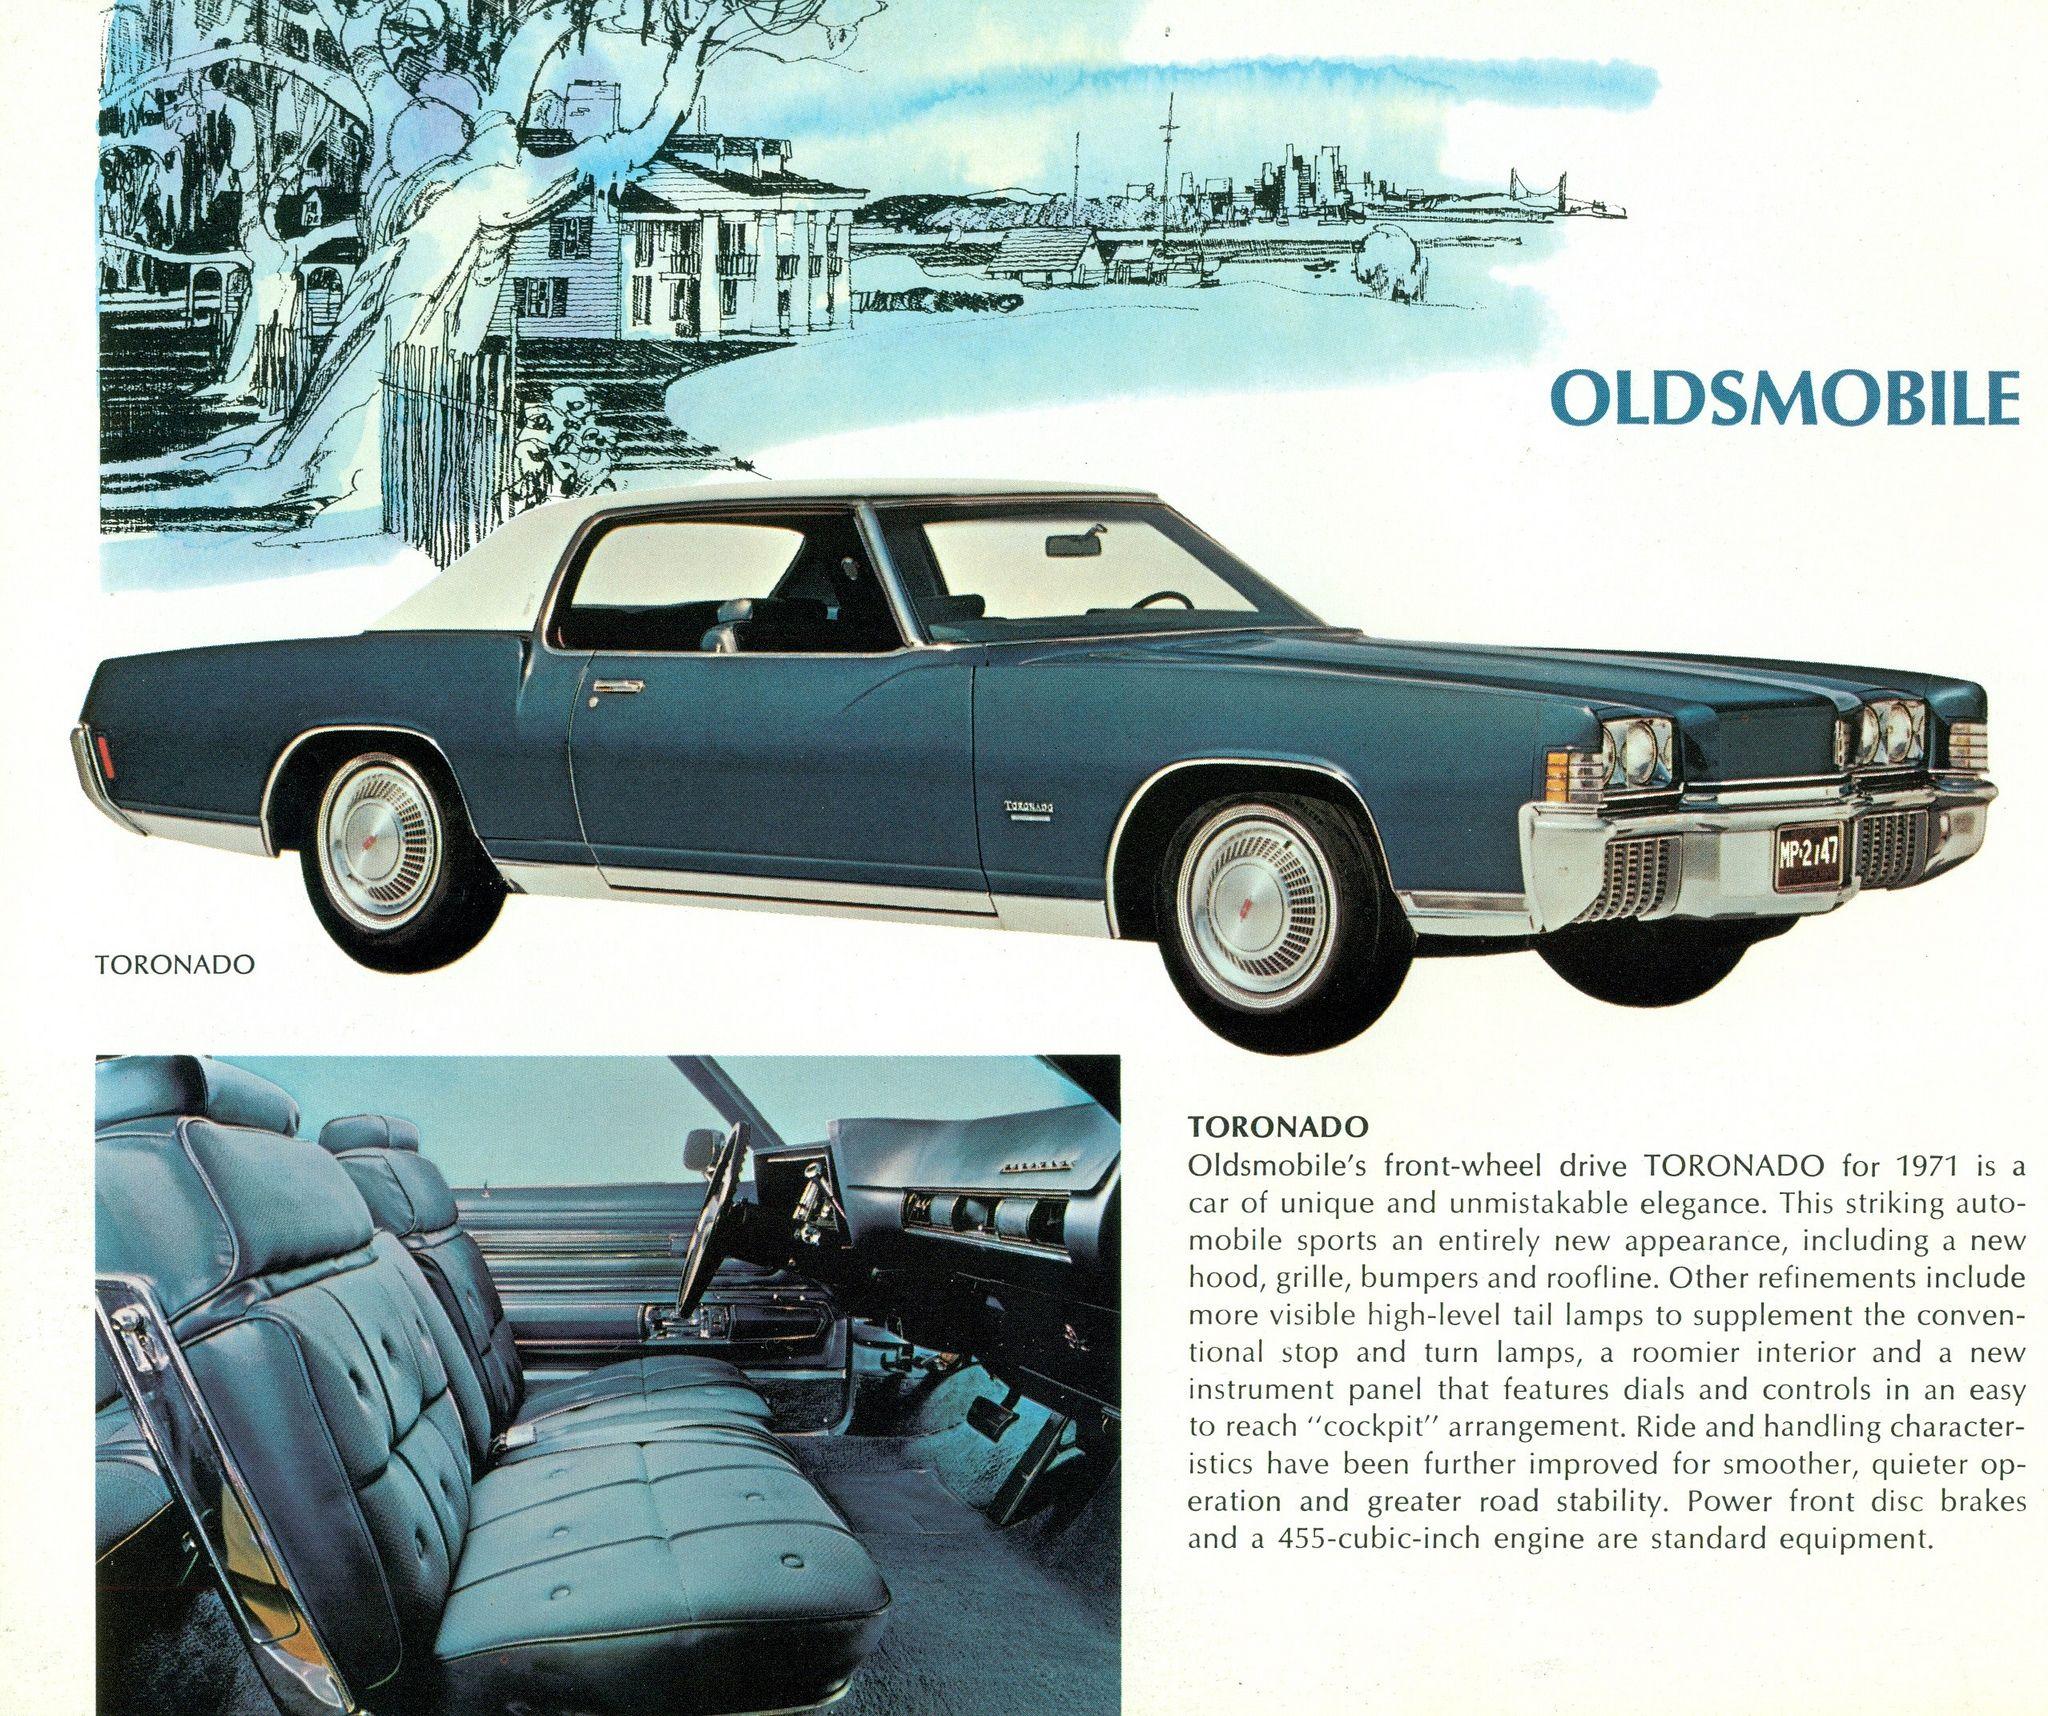 1971 Oldsmobile Toronado Oldsmobile Toronado Oldsmobile Automobile Advertising